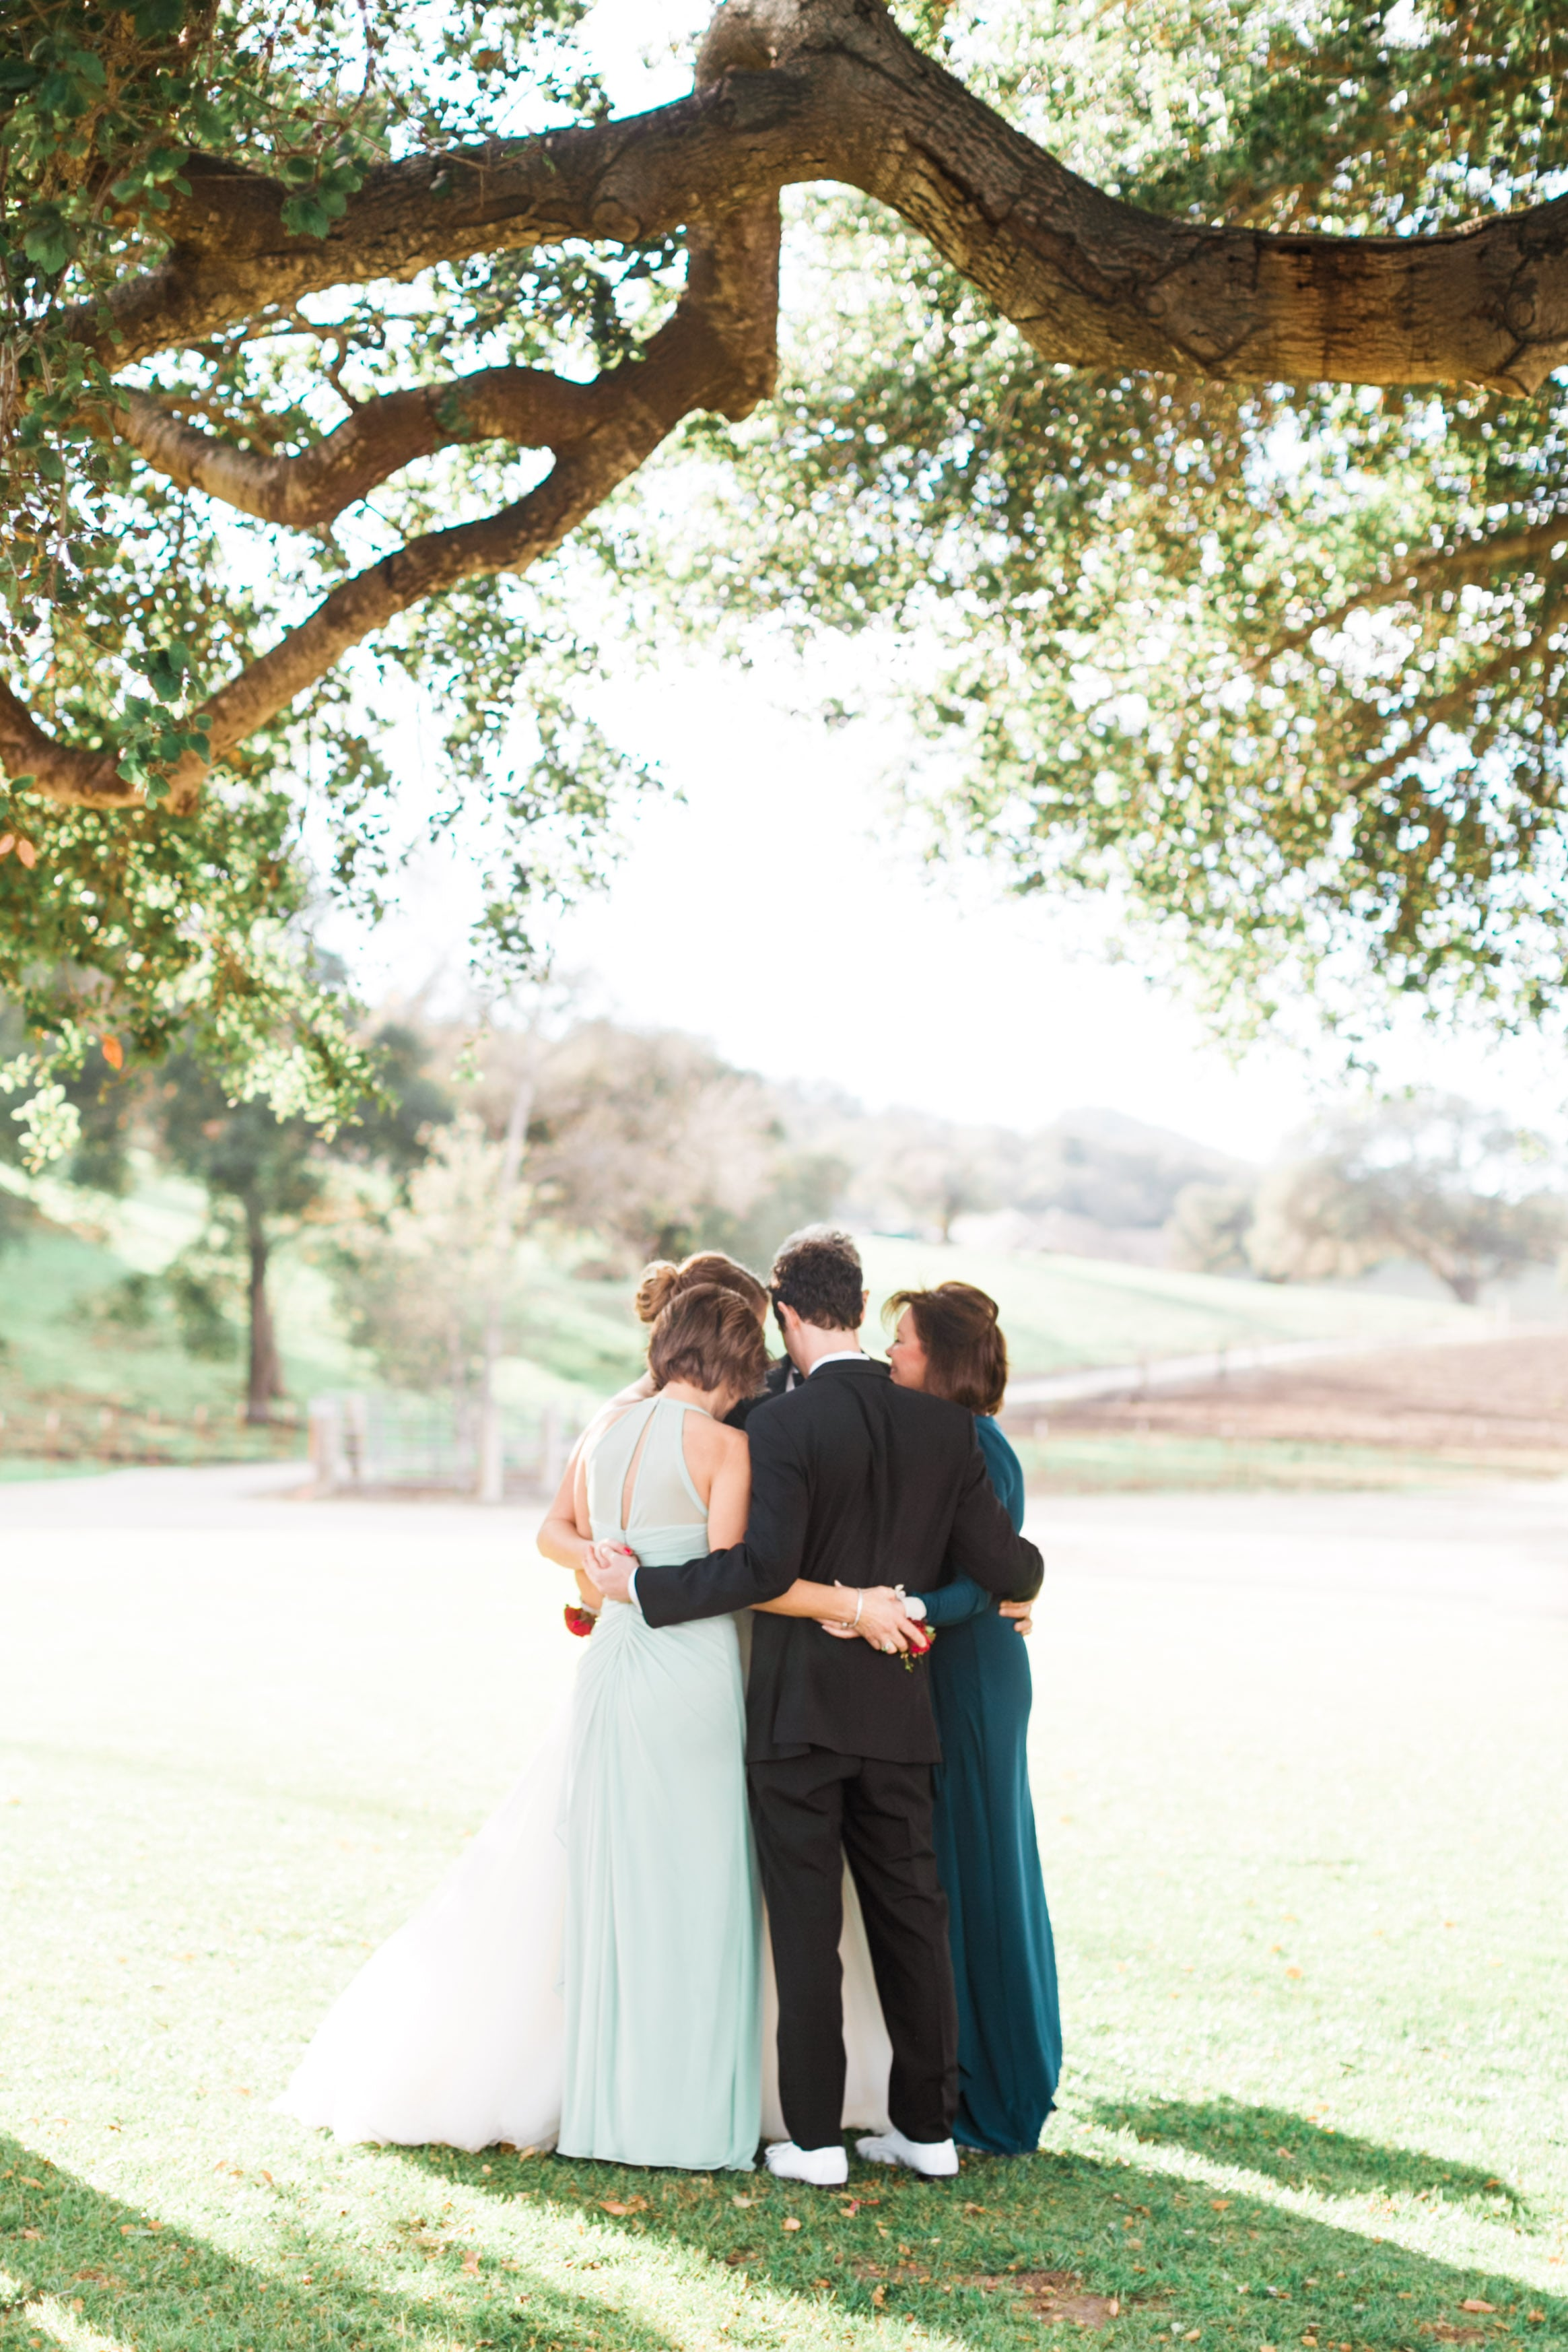 Natalie_Schutt_Photography_Winter_Wedding_San_Luis_Obispo-123.jpg